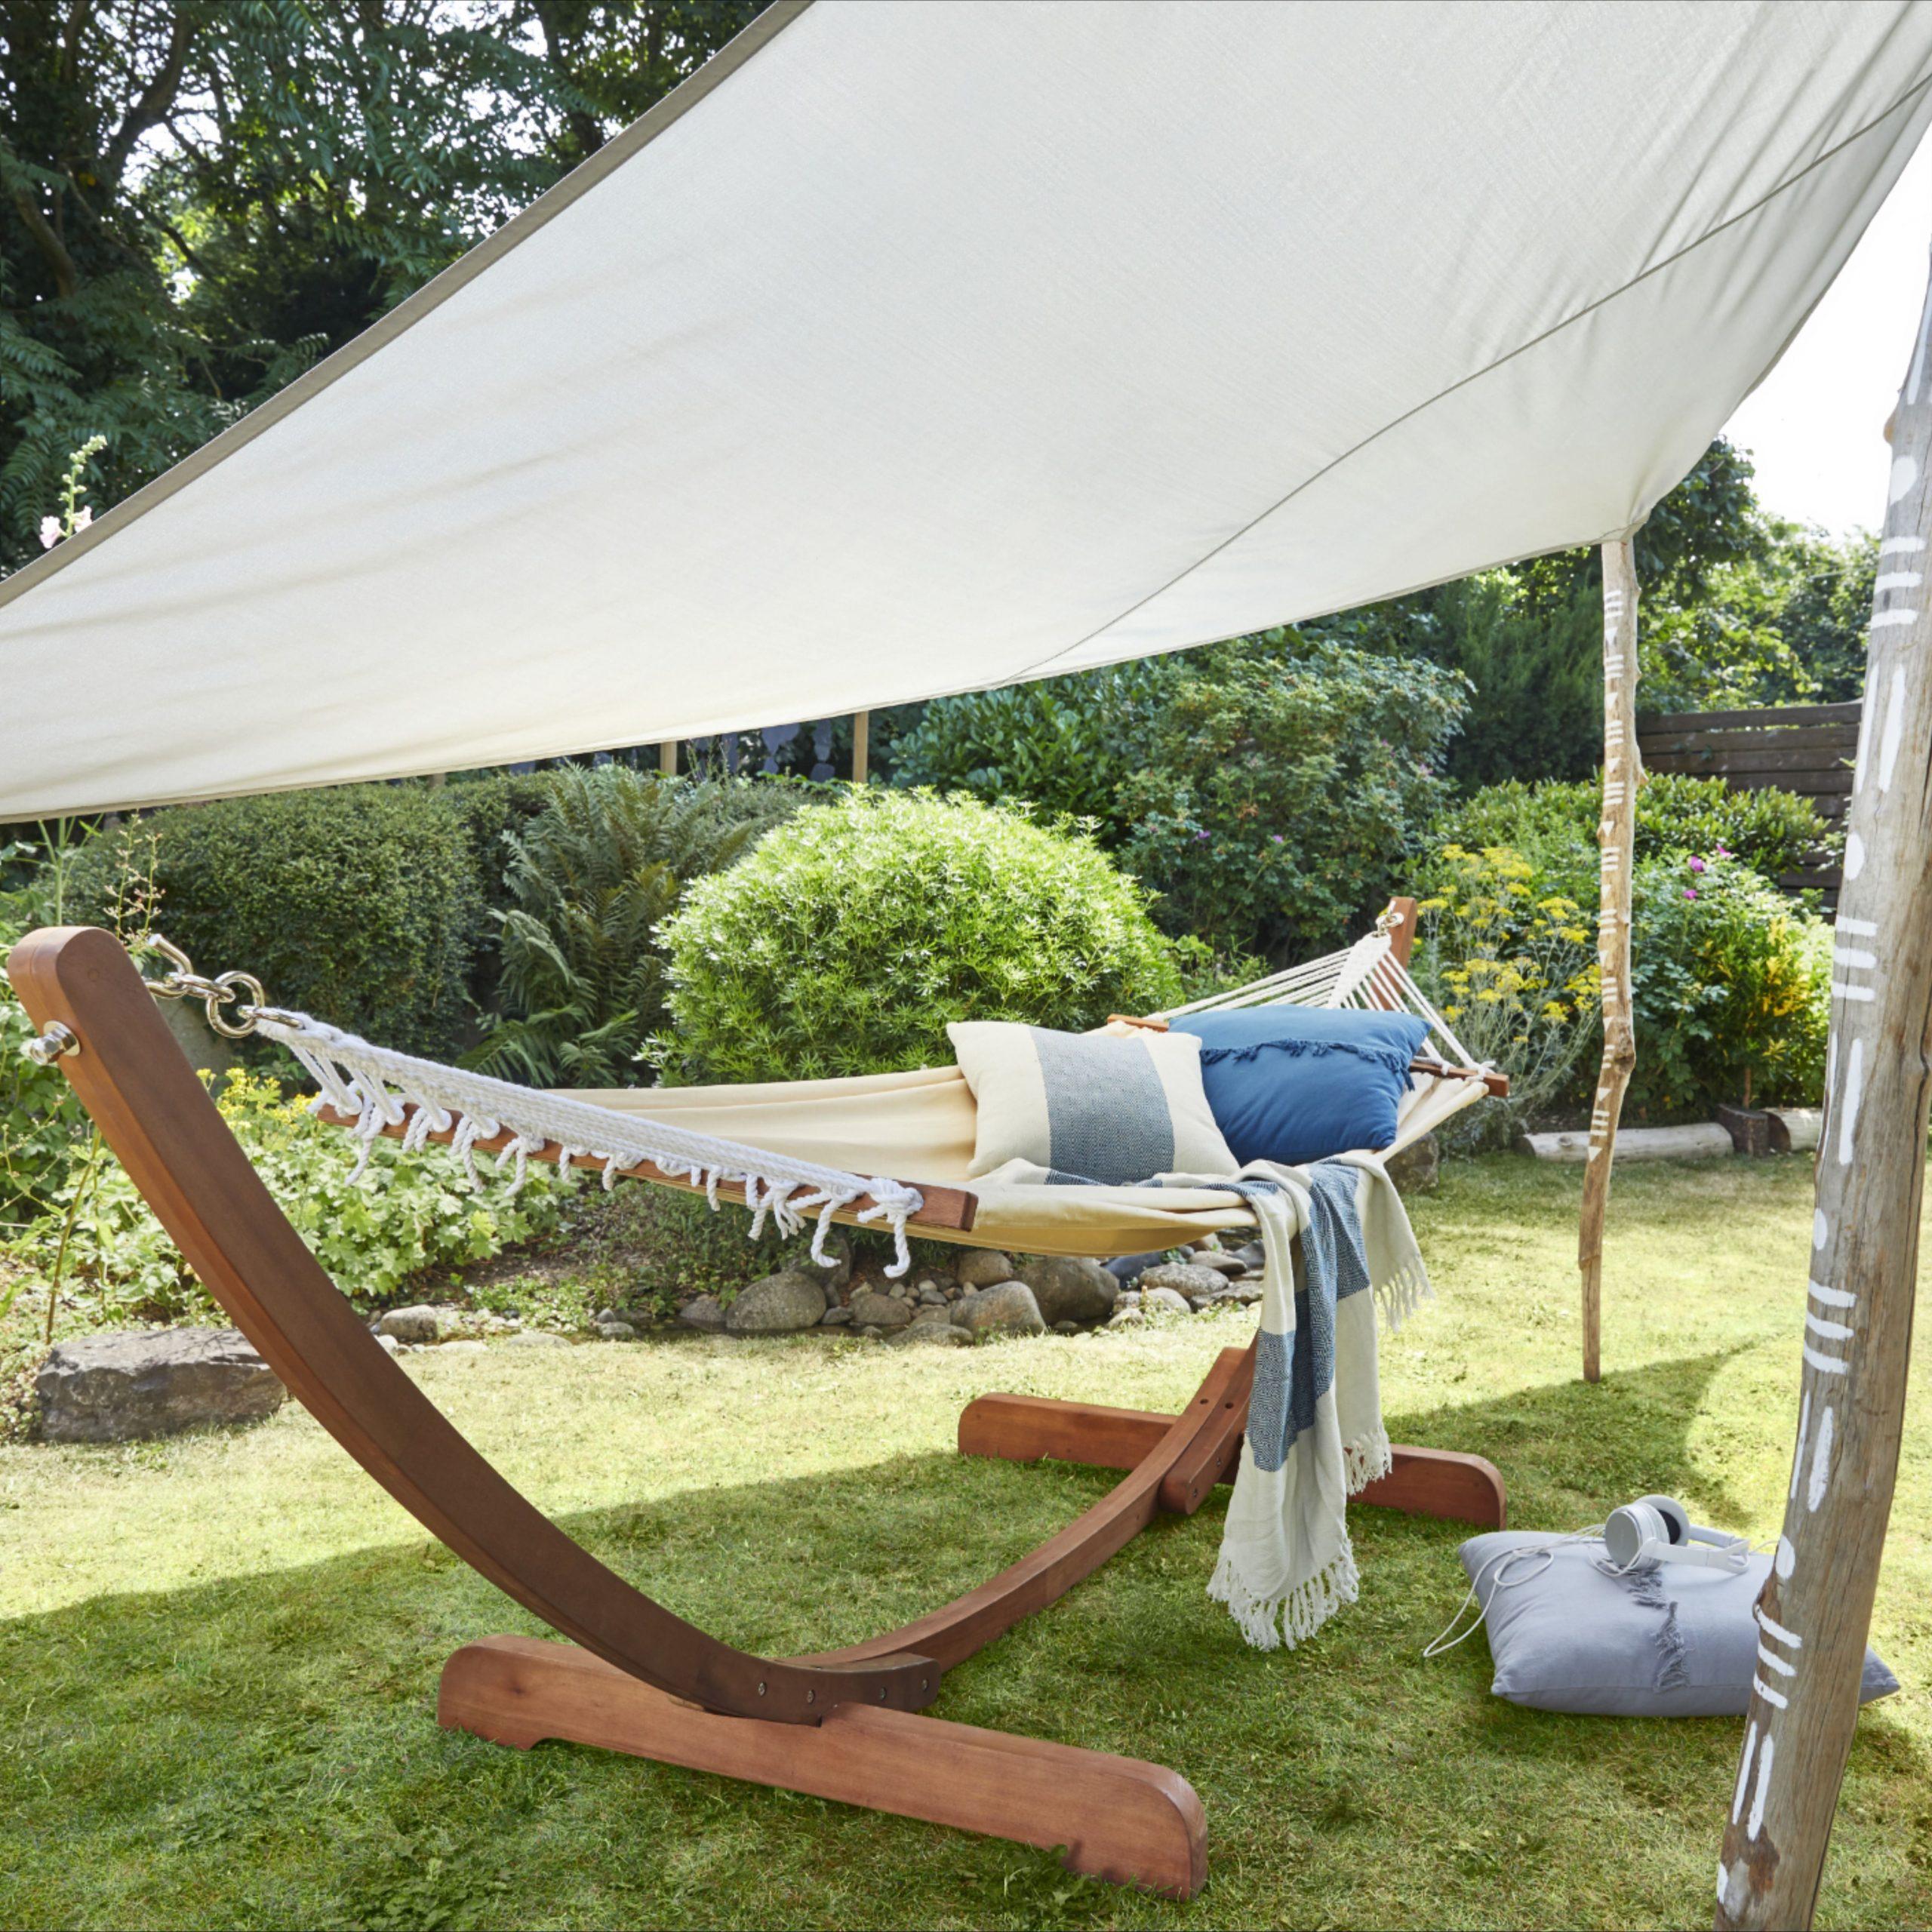 Hamac Et Support Bois Blooma Lopevi Macadamia   Mobilier ... intérieur Balancelle De Jardin Castorama